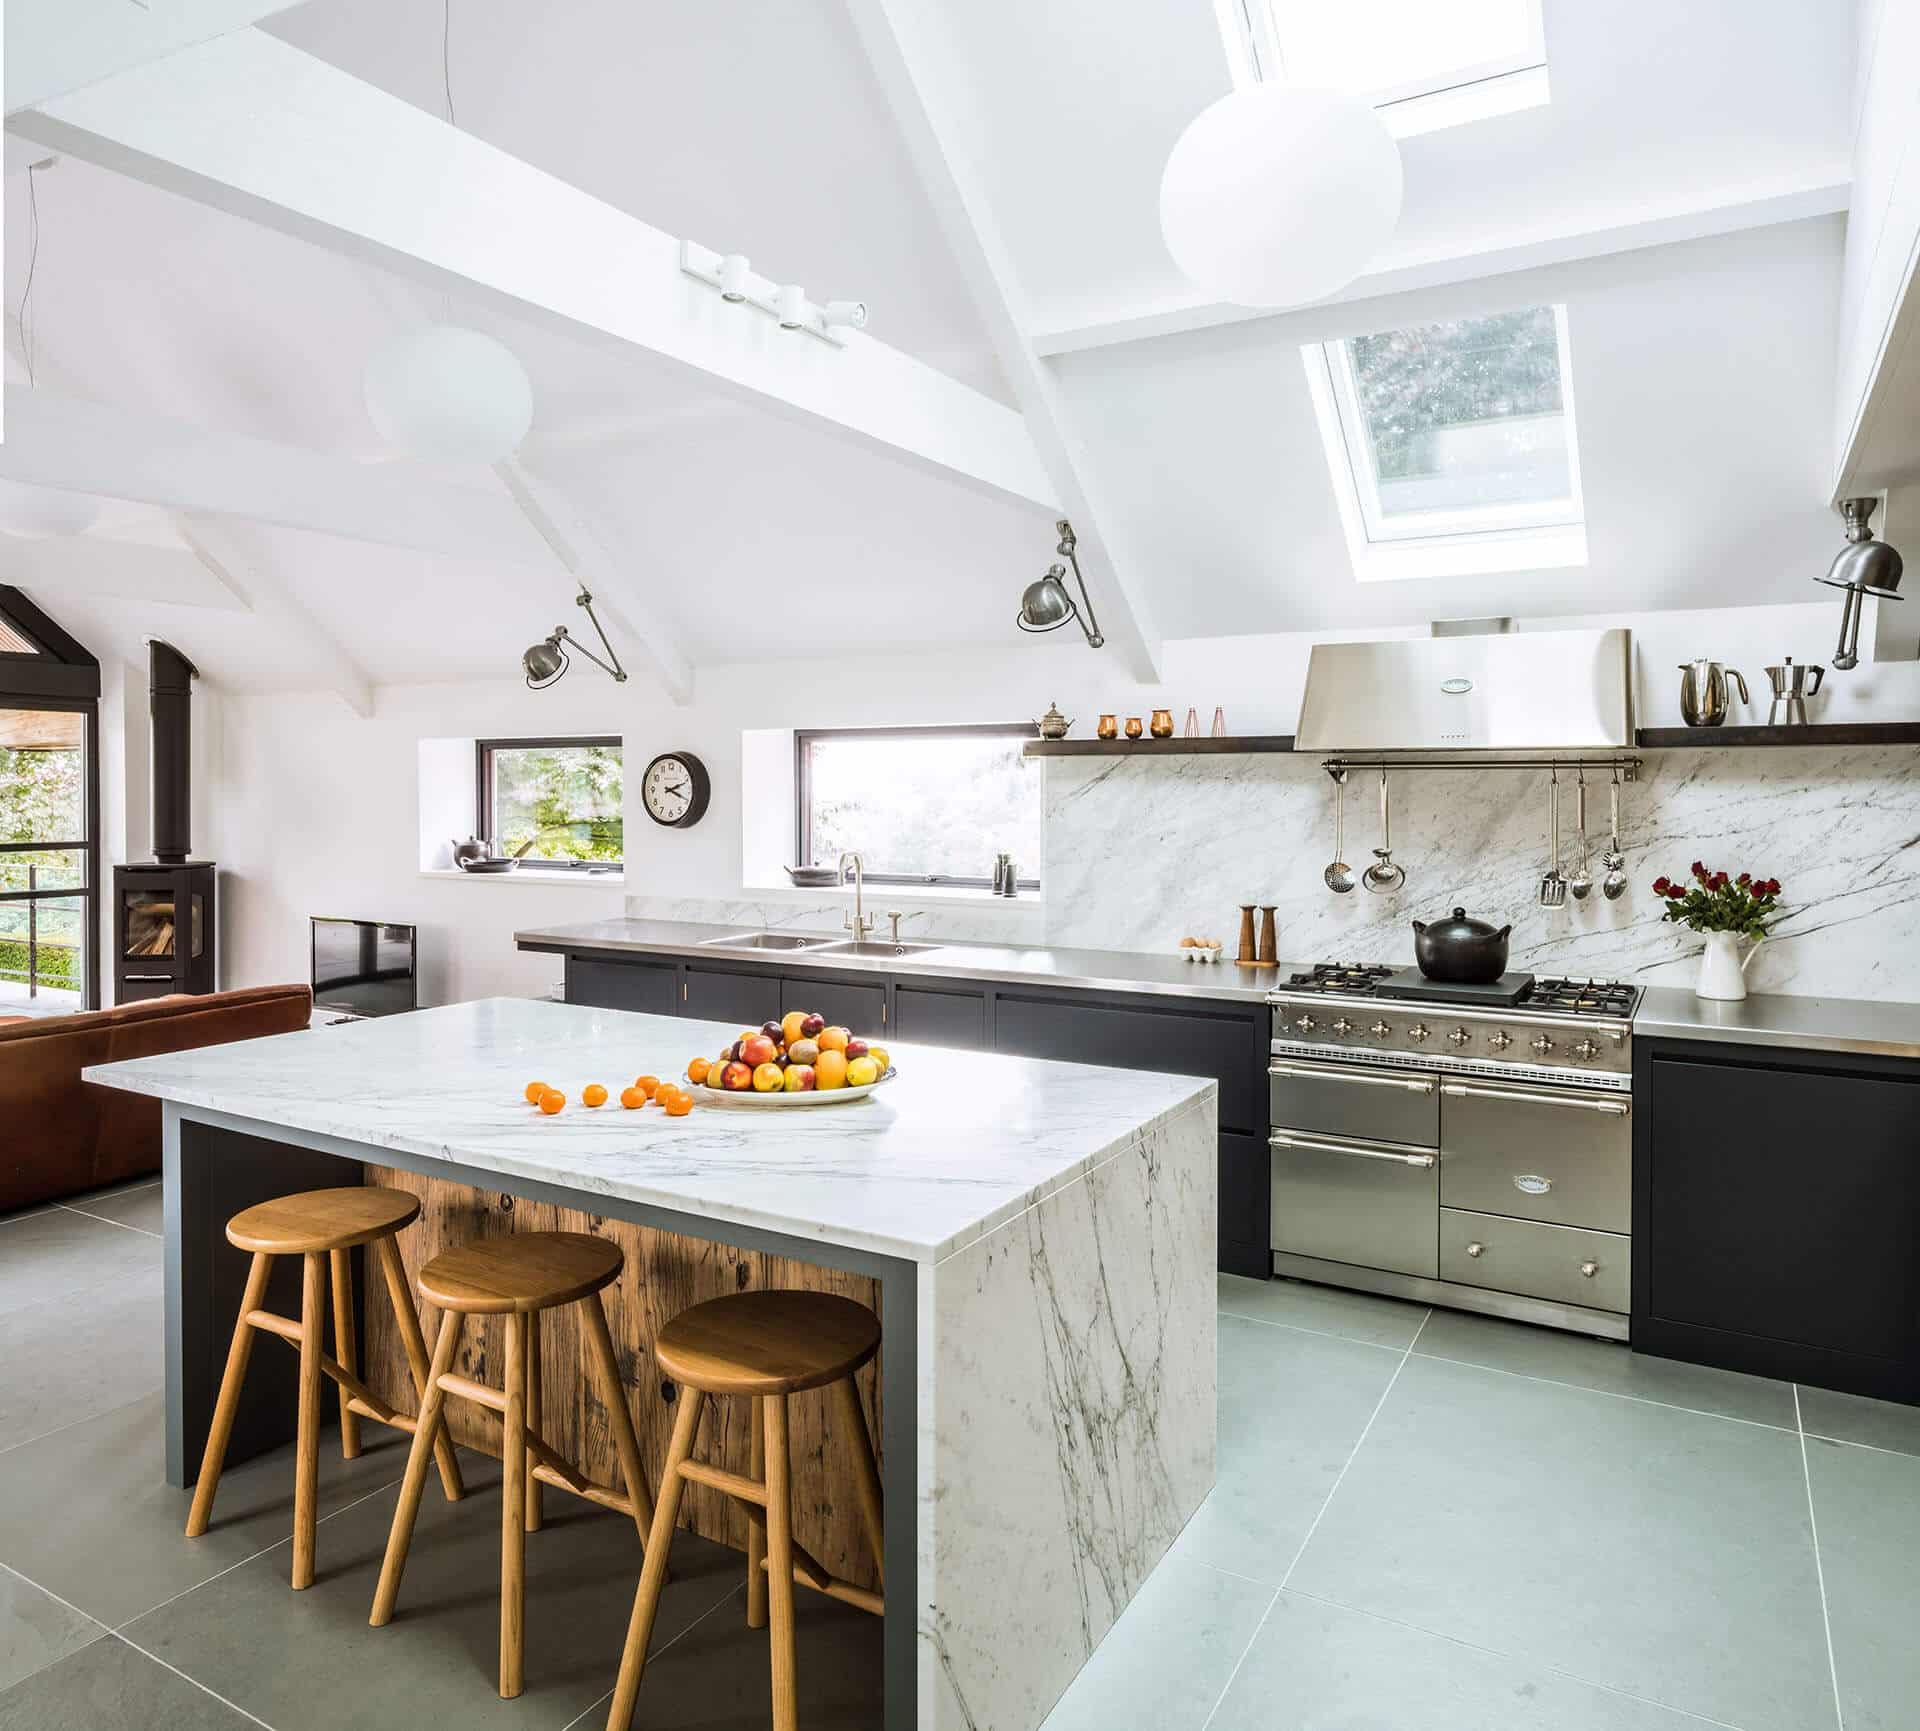 outstanding reclaimed wood kitchen island   Steel, Marble, Reclaimed Wood Kitchen - Sustainable Kitchens